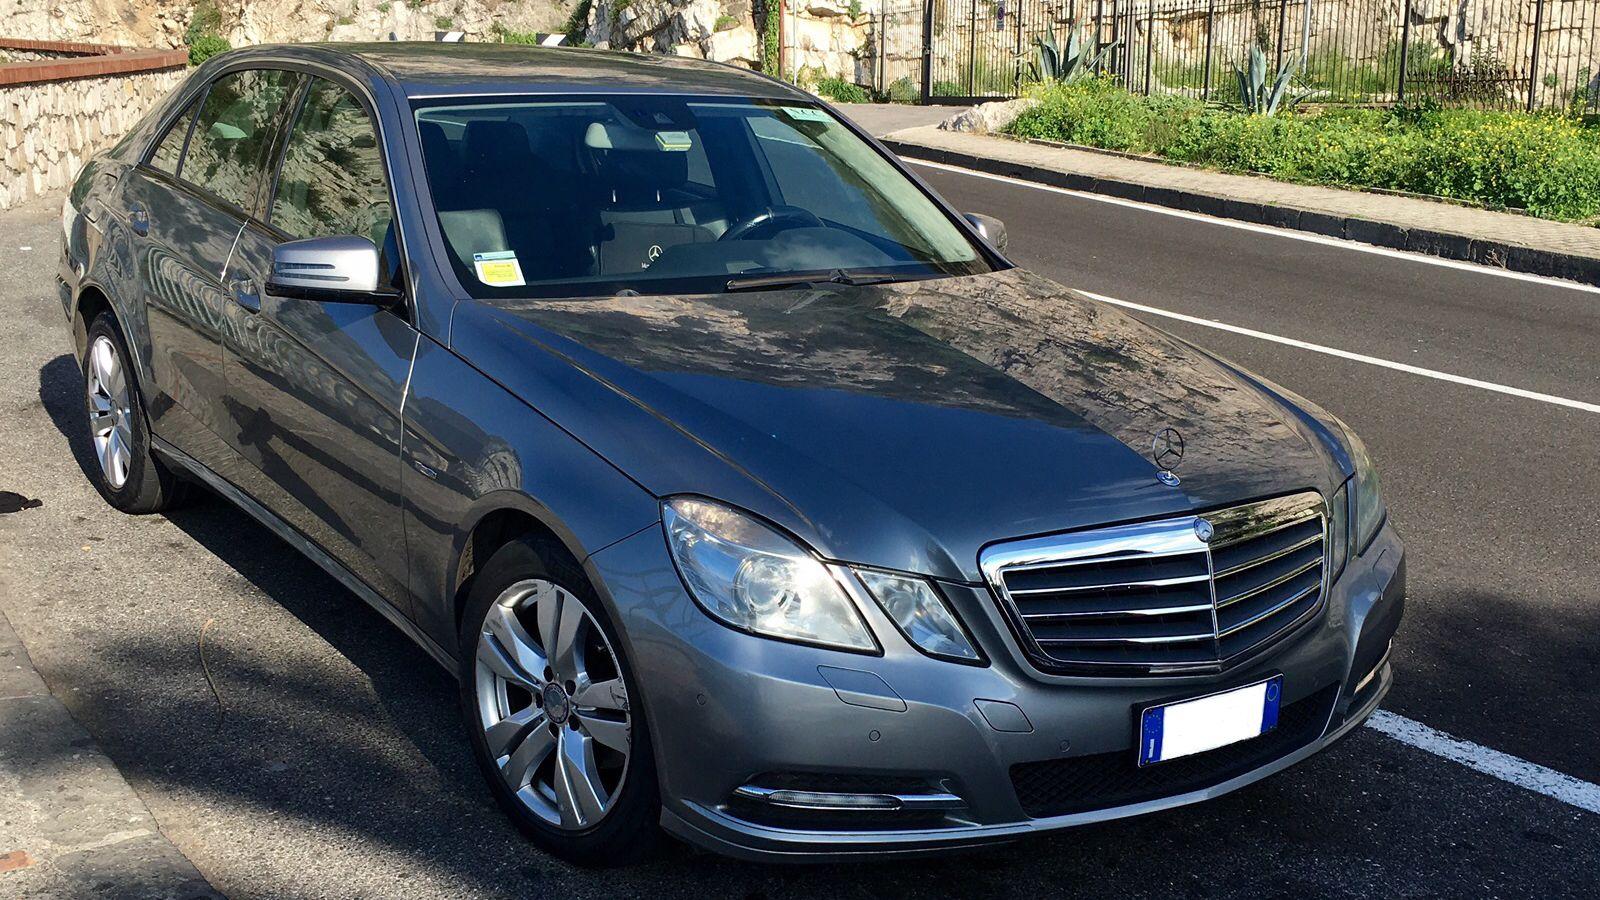 Private Standard Car: Sorrento - Amalfi Coast